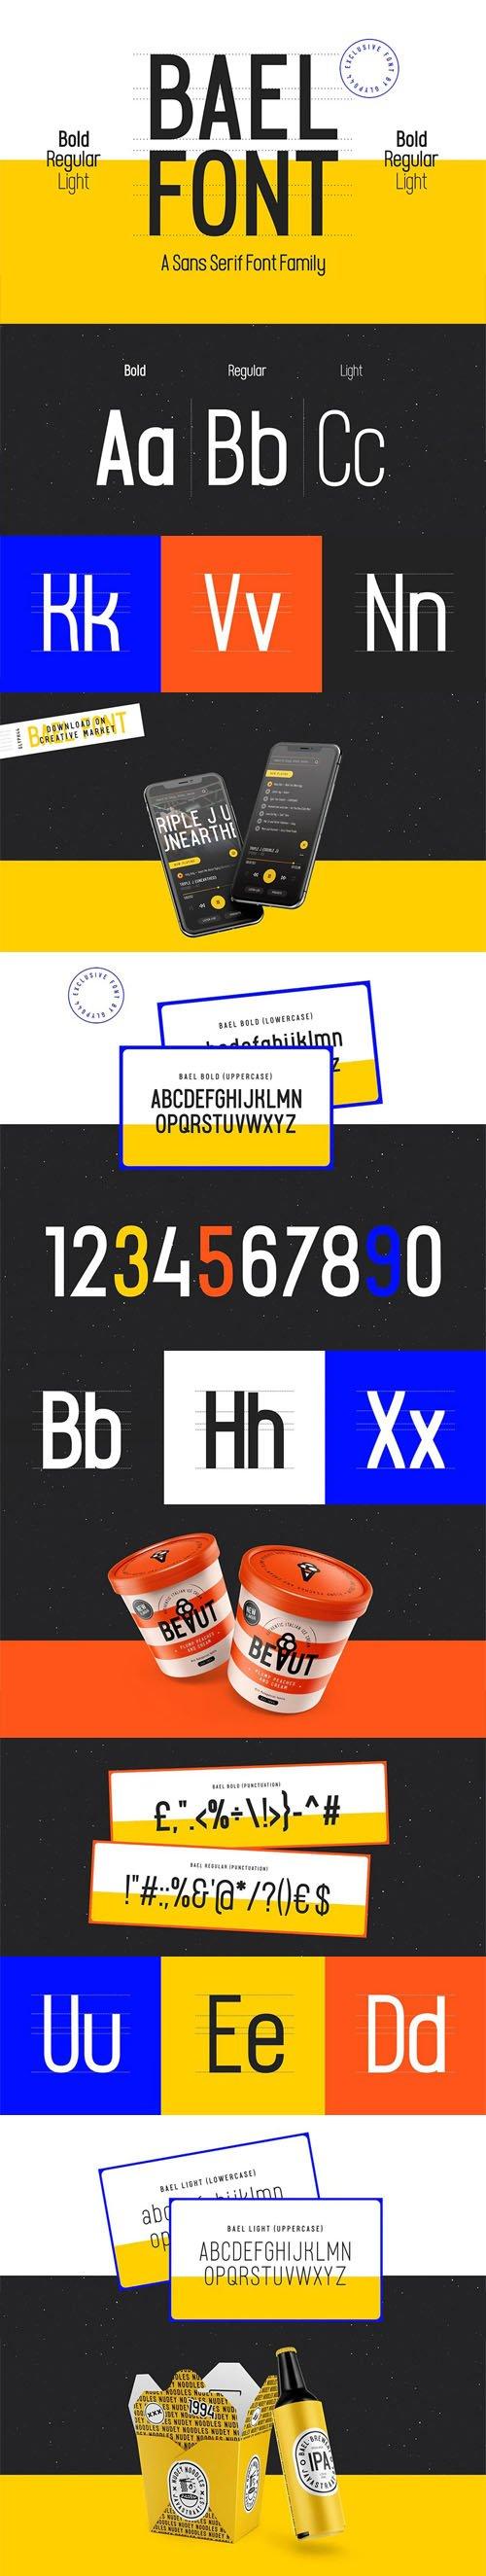 Bael Light - A Sans Serif Font